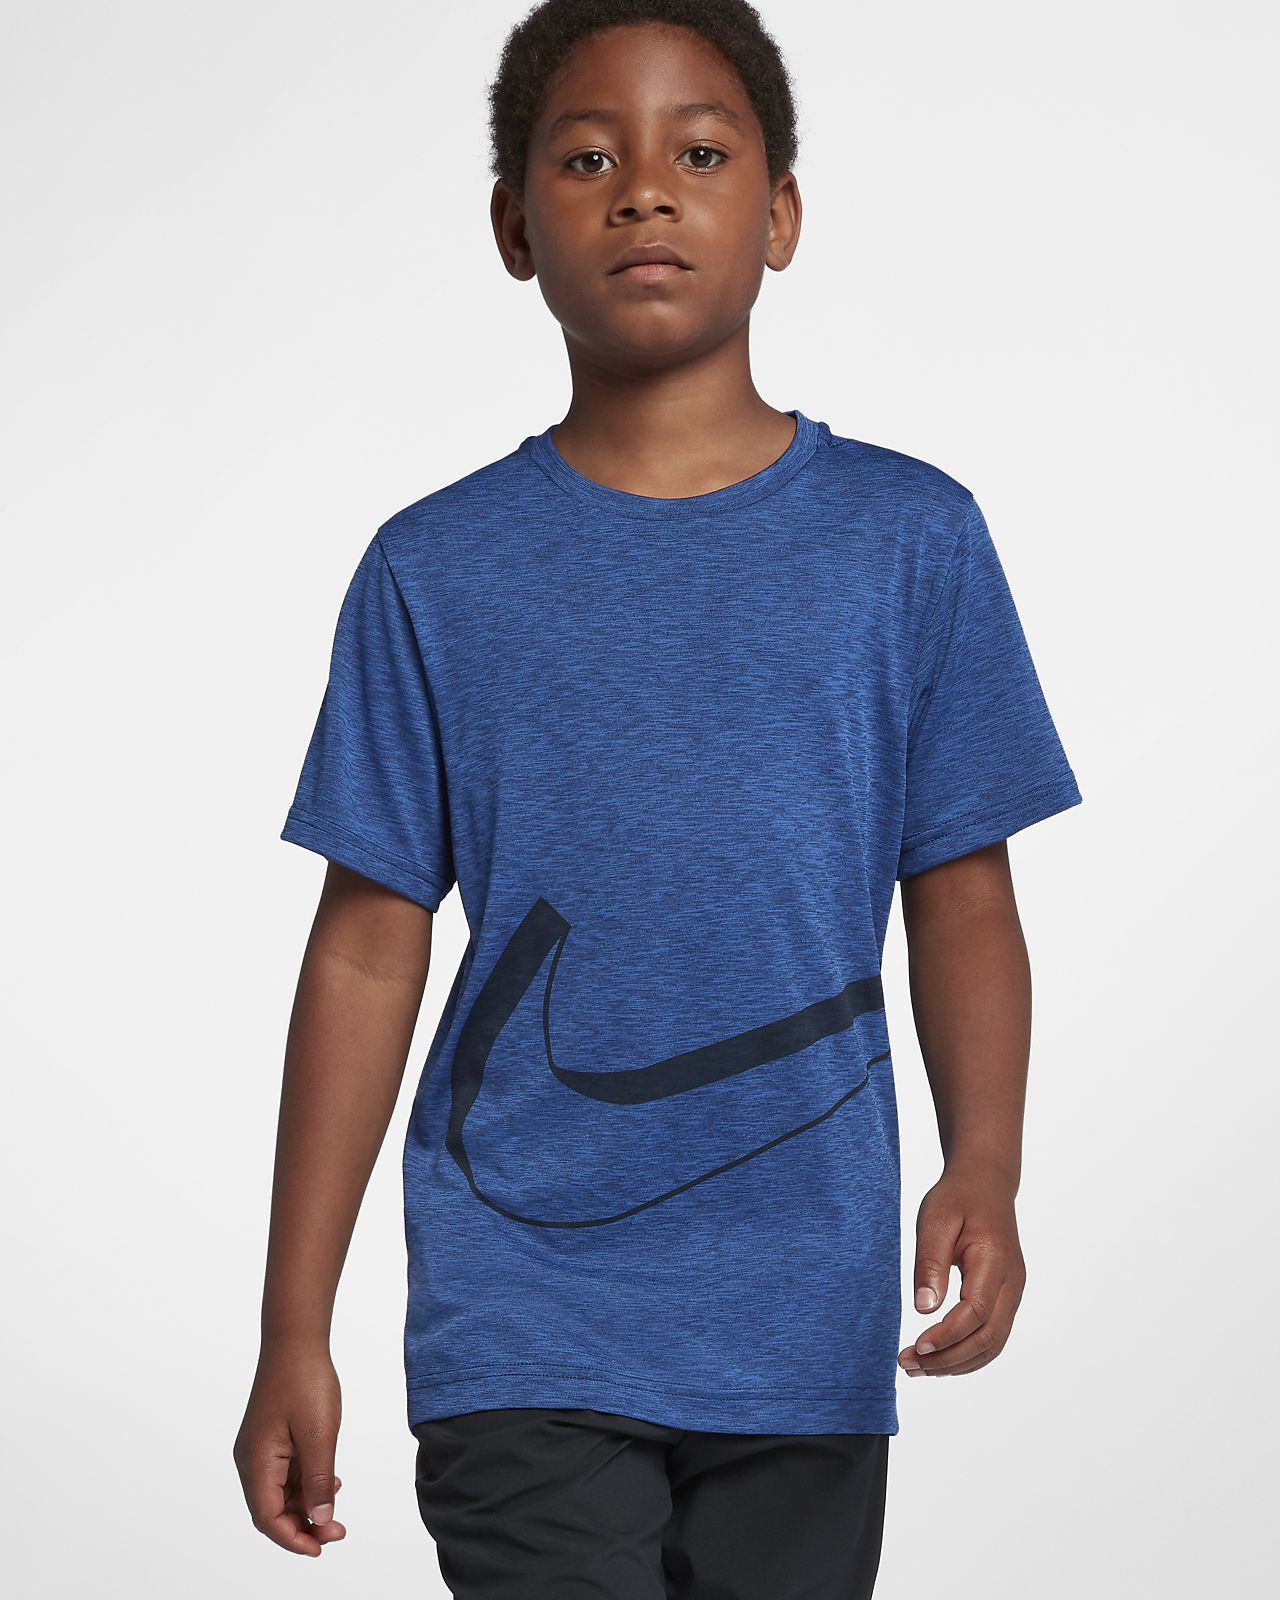 Top de entrenamiento manga corta para niño talla grande Nike Dri-FIT Breathe